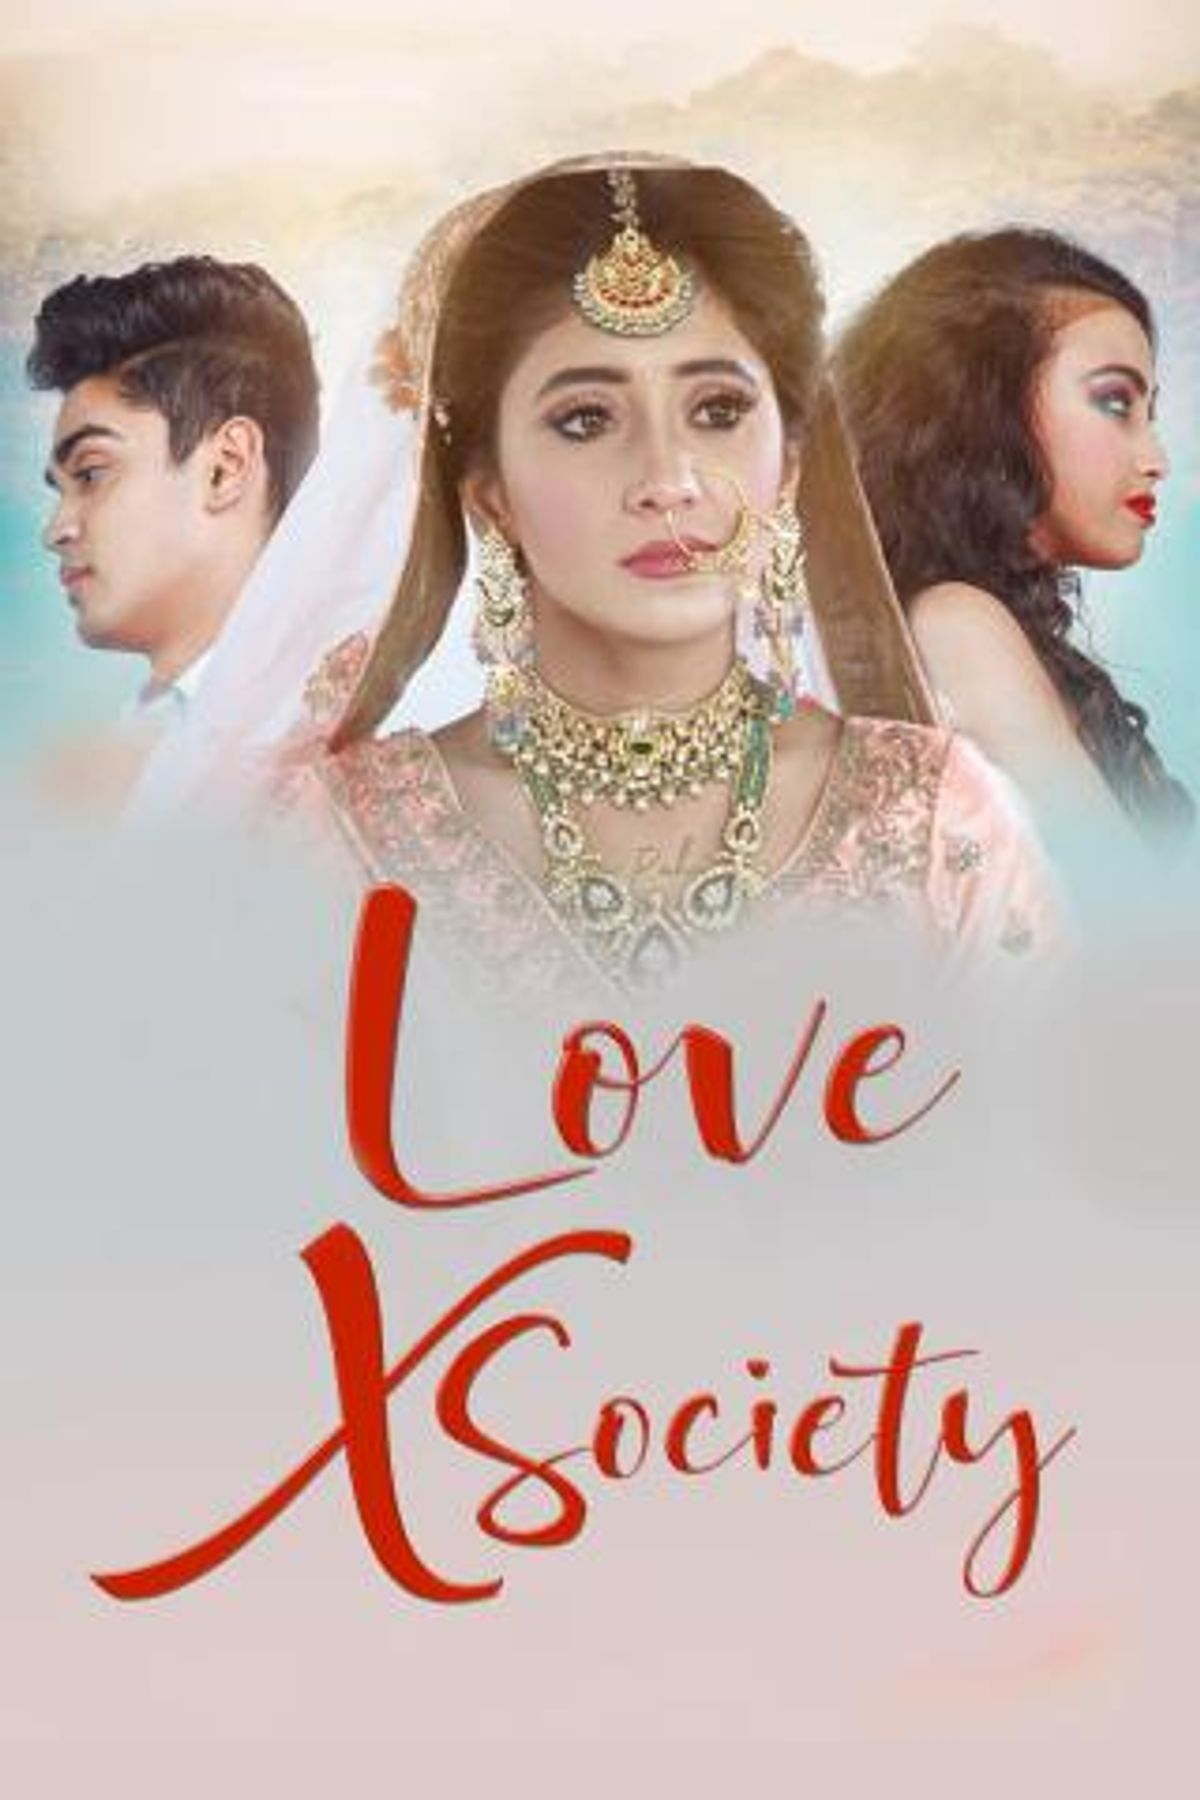 Love X Society (Short Film)